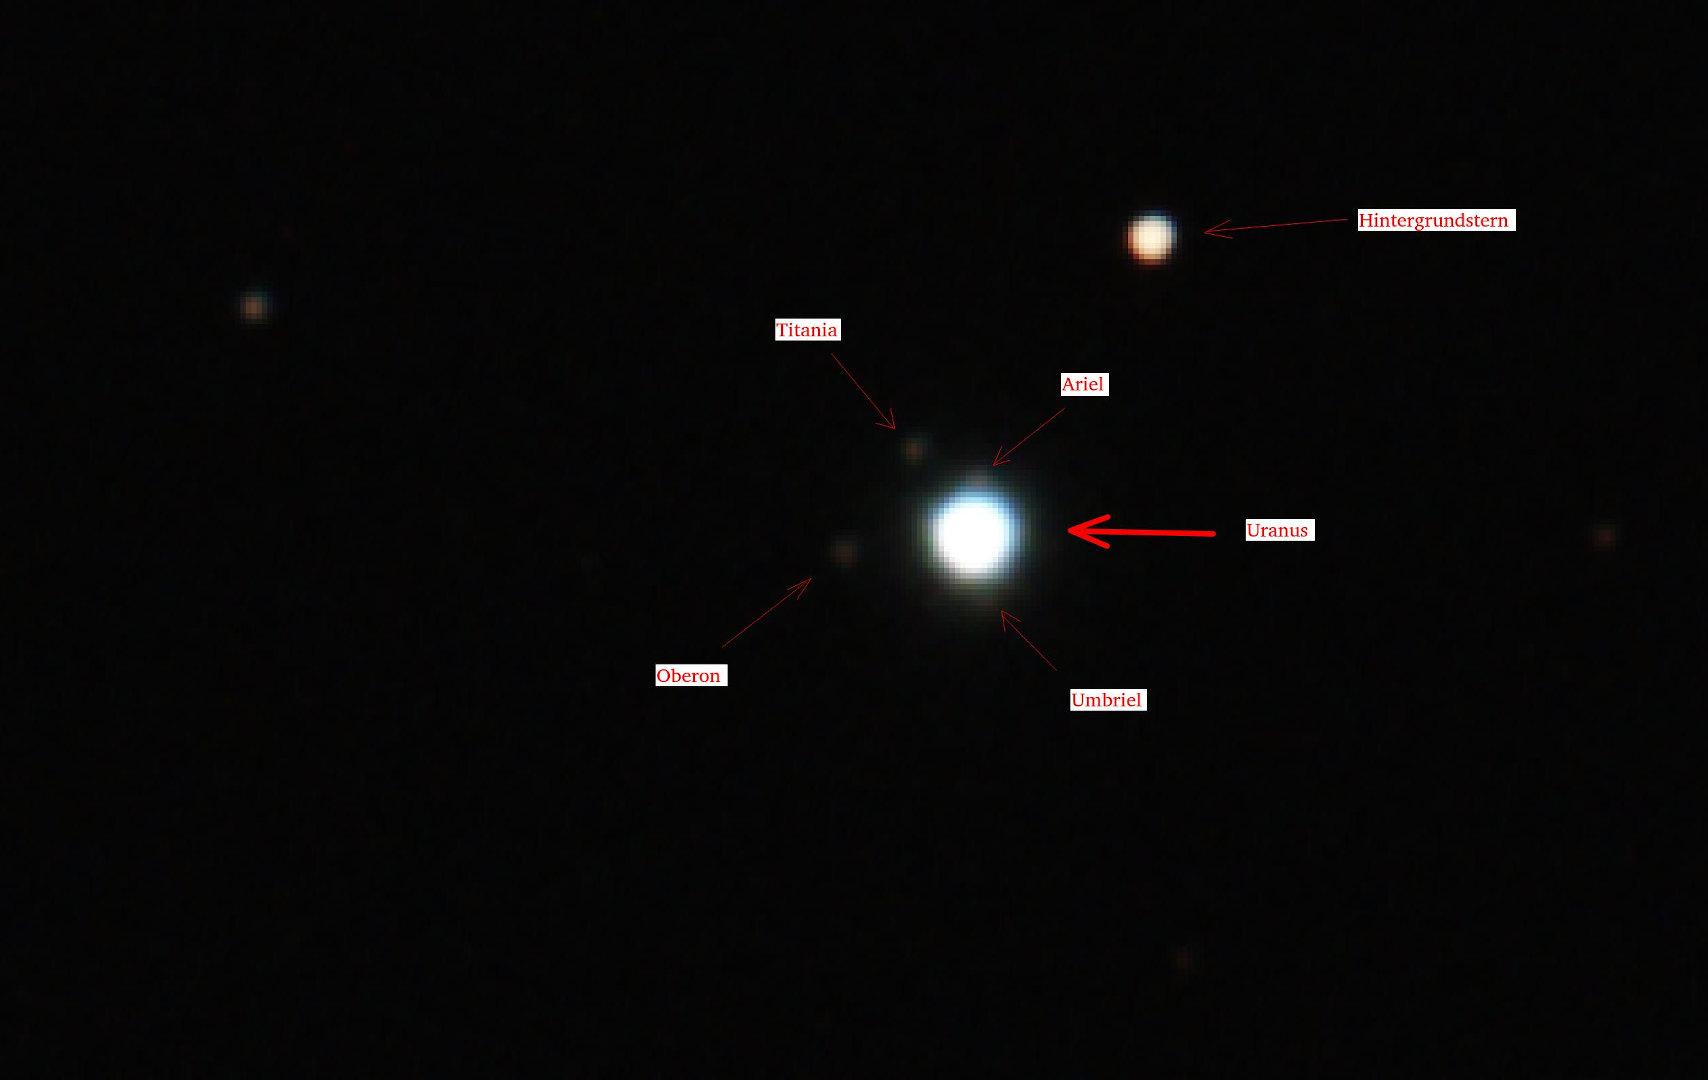 Uranus_text_crop_S4-1080.jpg